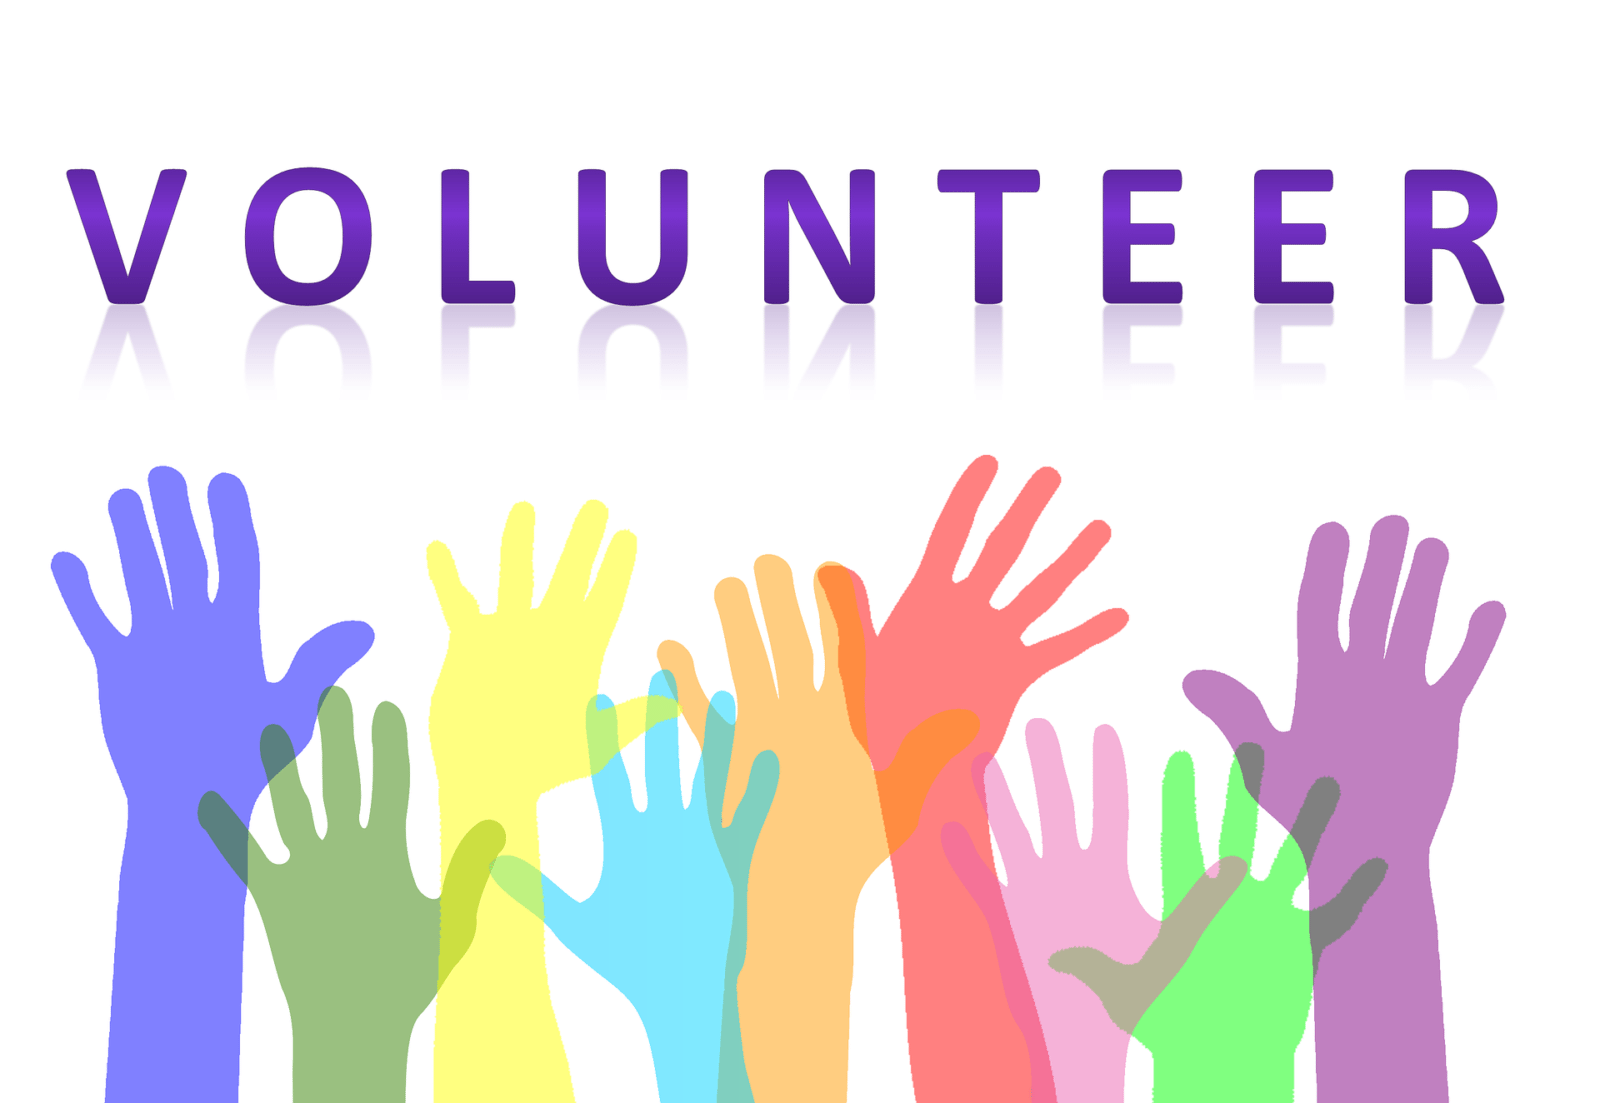 Volunteer Work Tax Deductible?